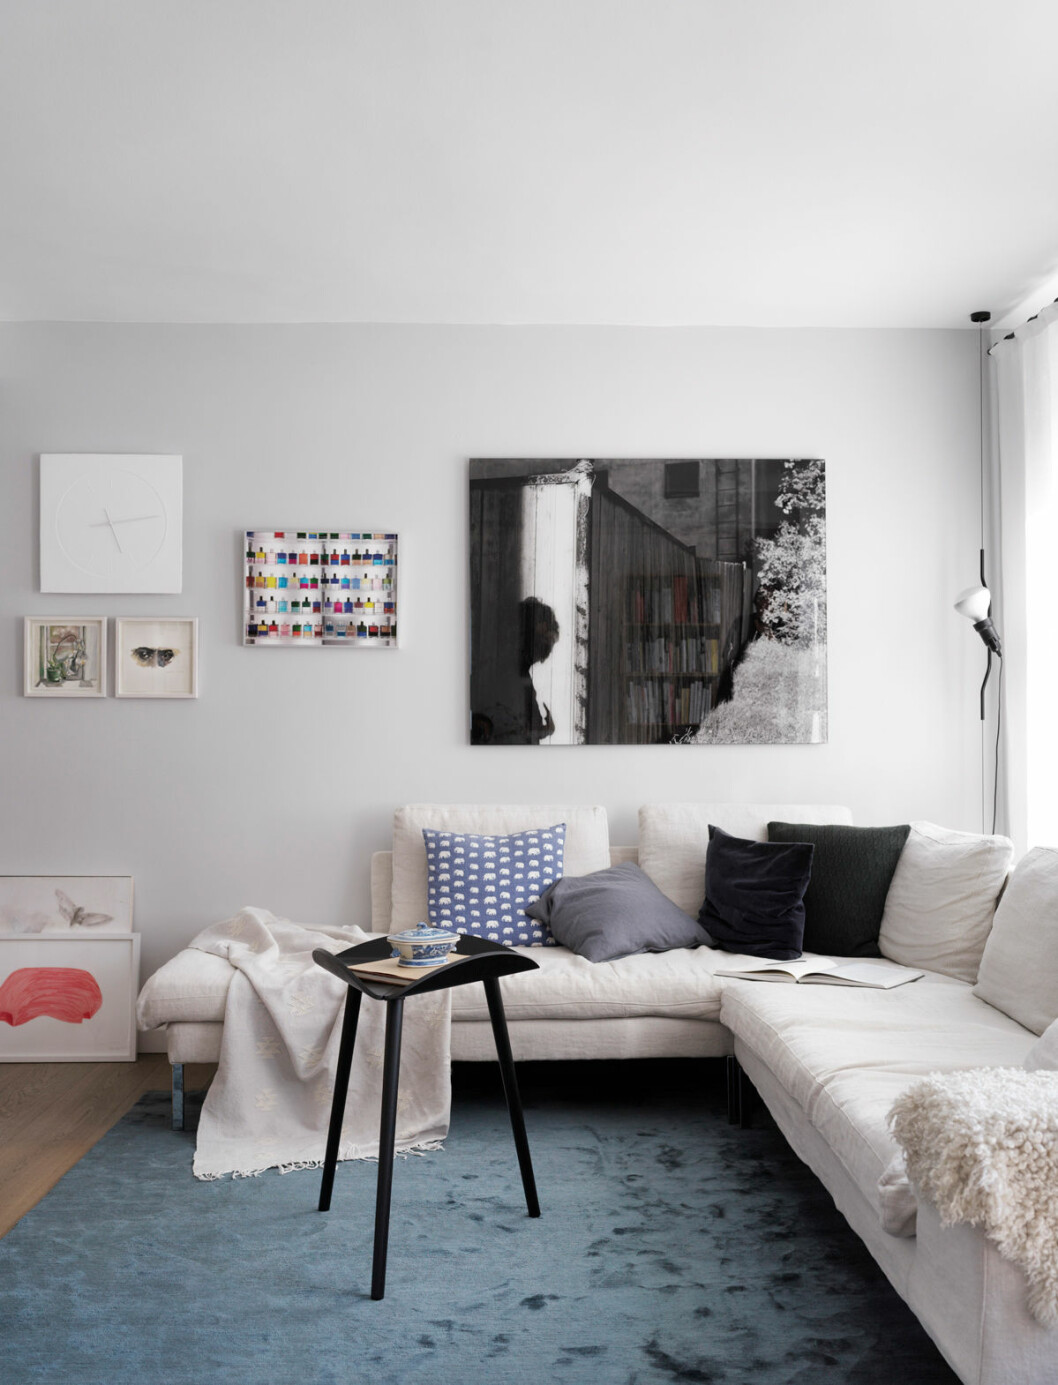 Hemma hos Mia Lagerman Köpenhamn vardagsrum soffa tavla